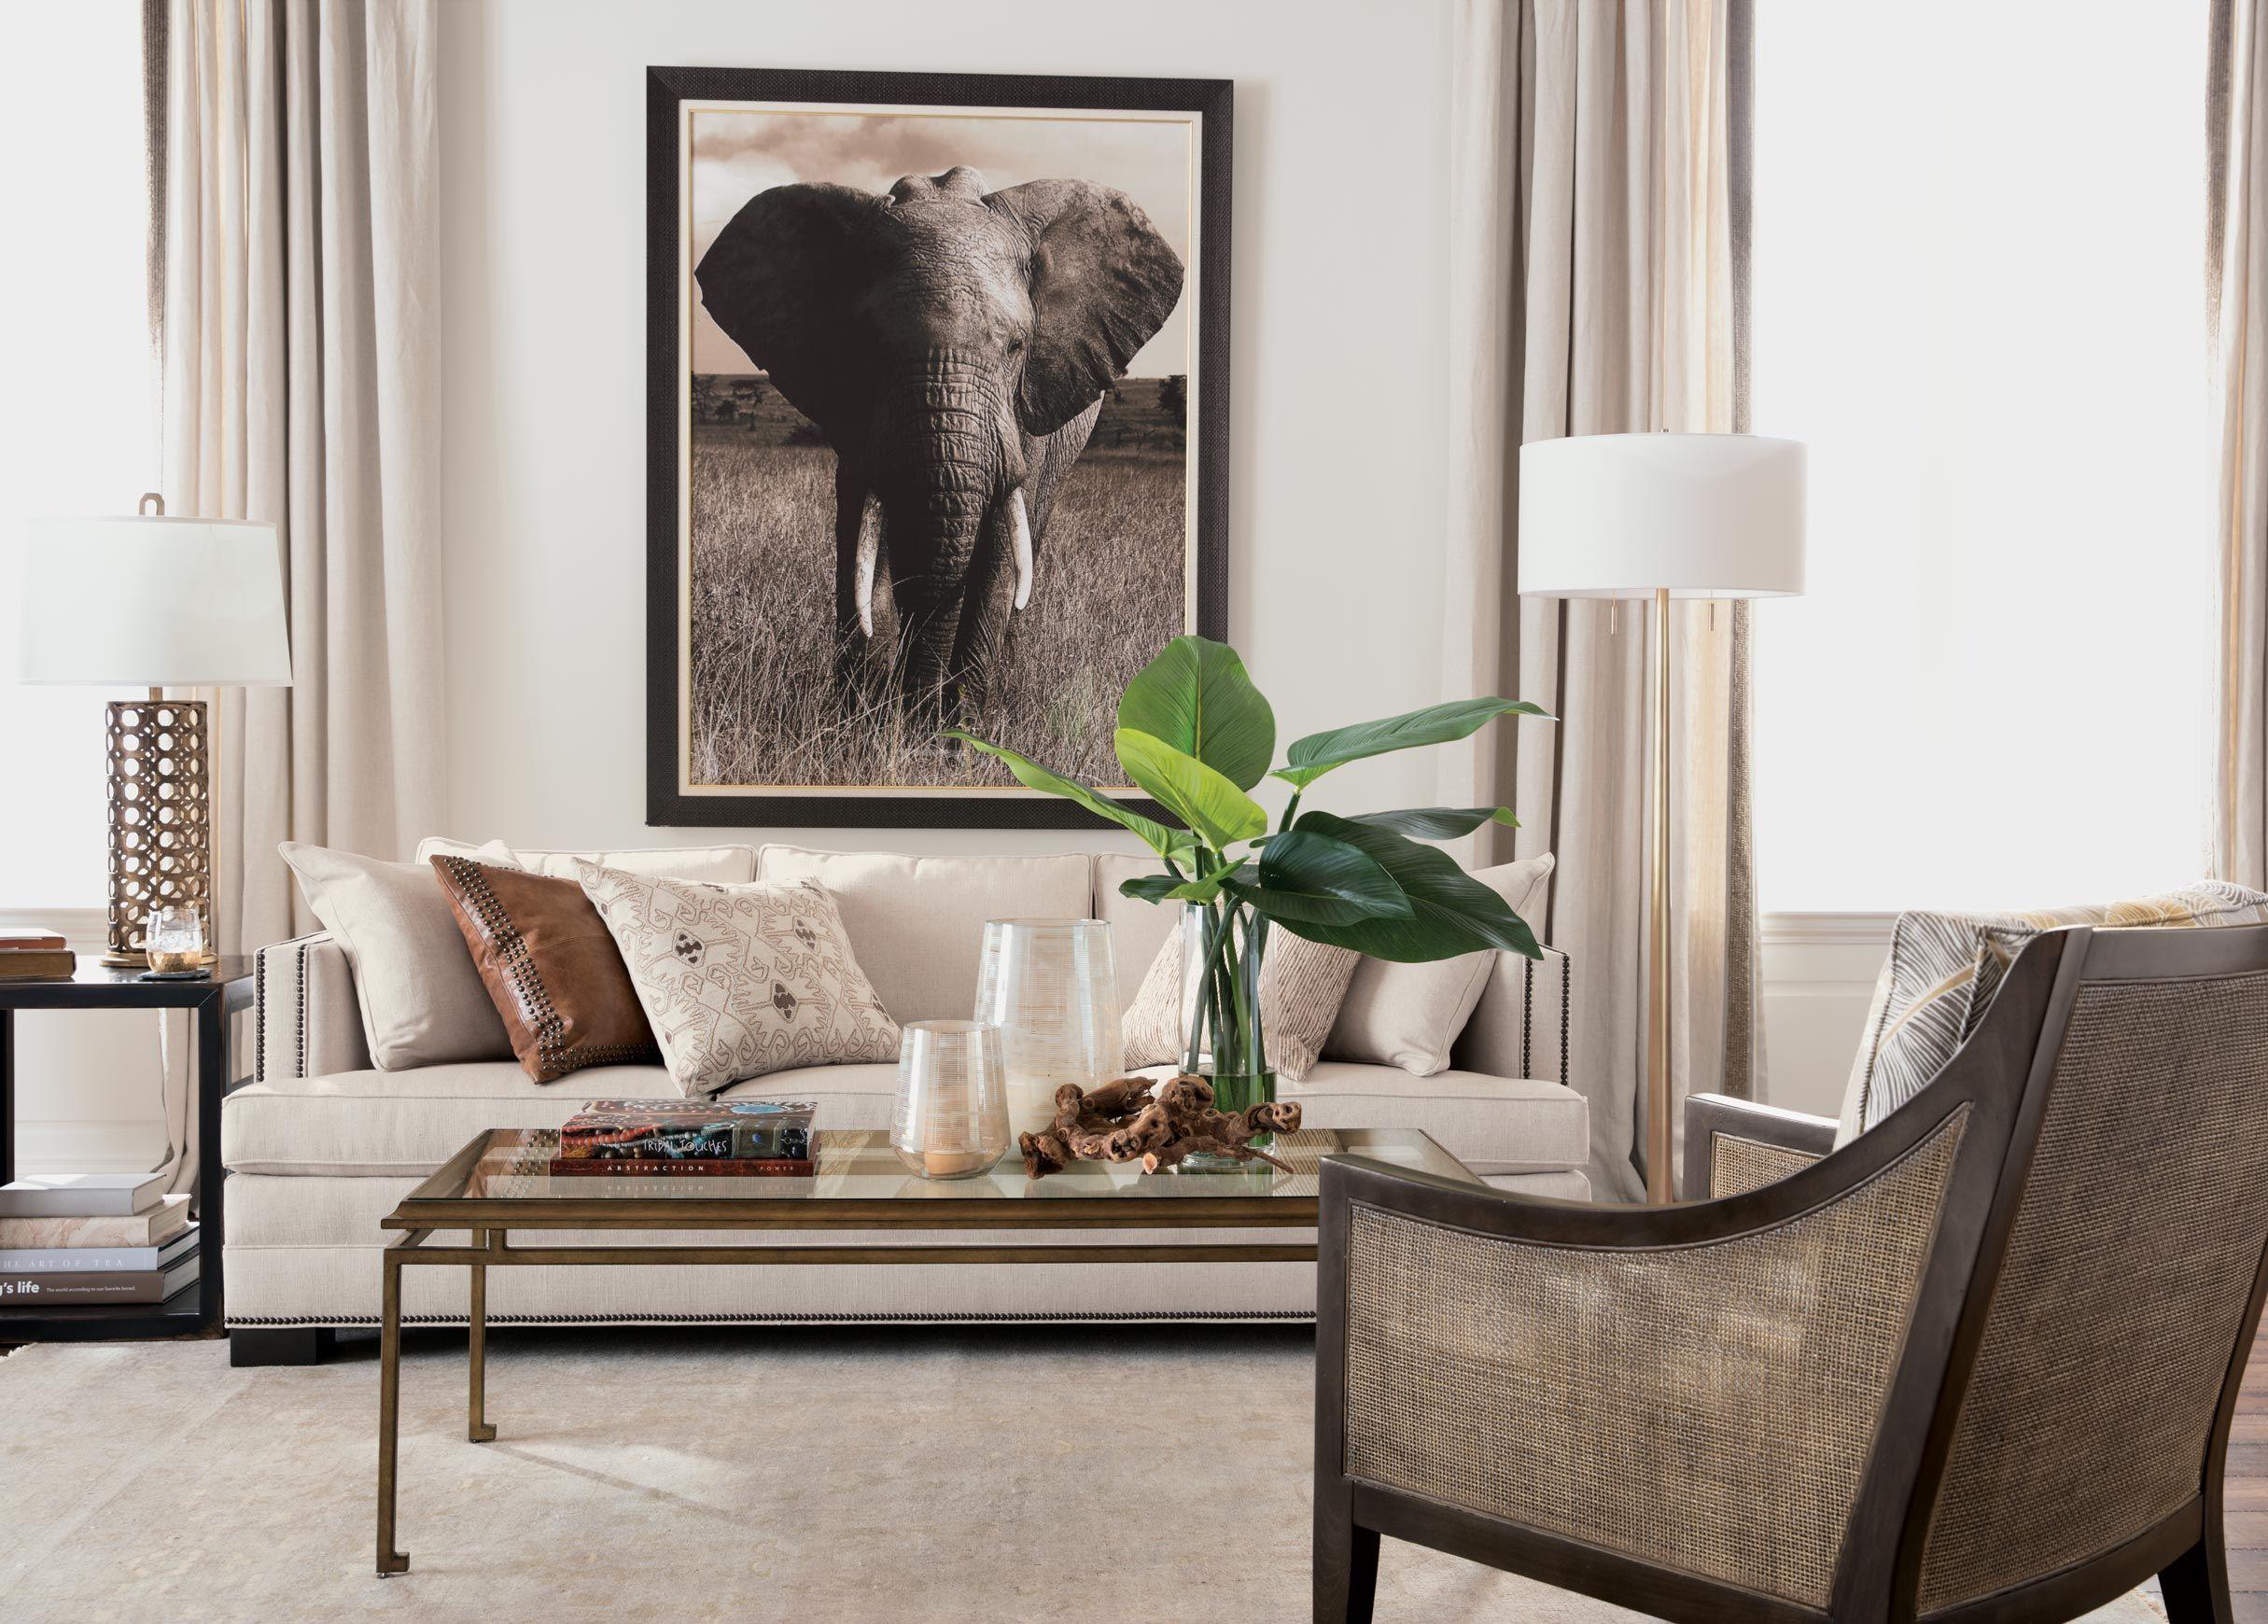 Elephant Woven Chair Home Decor Furniture